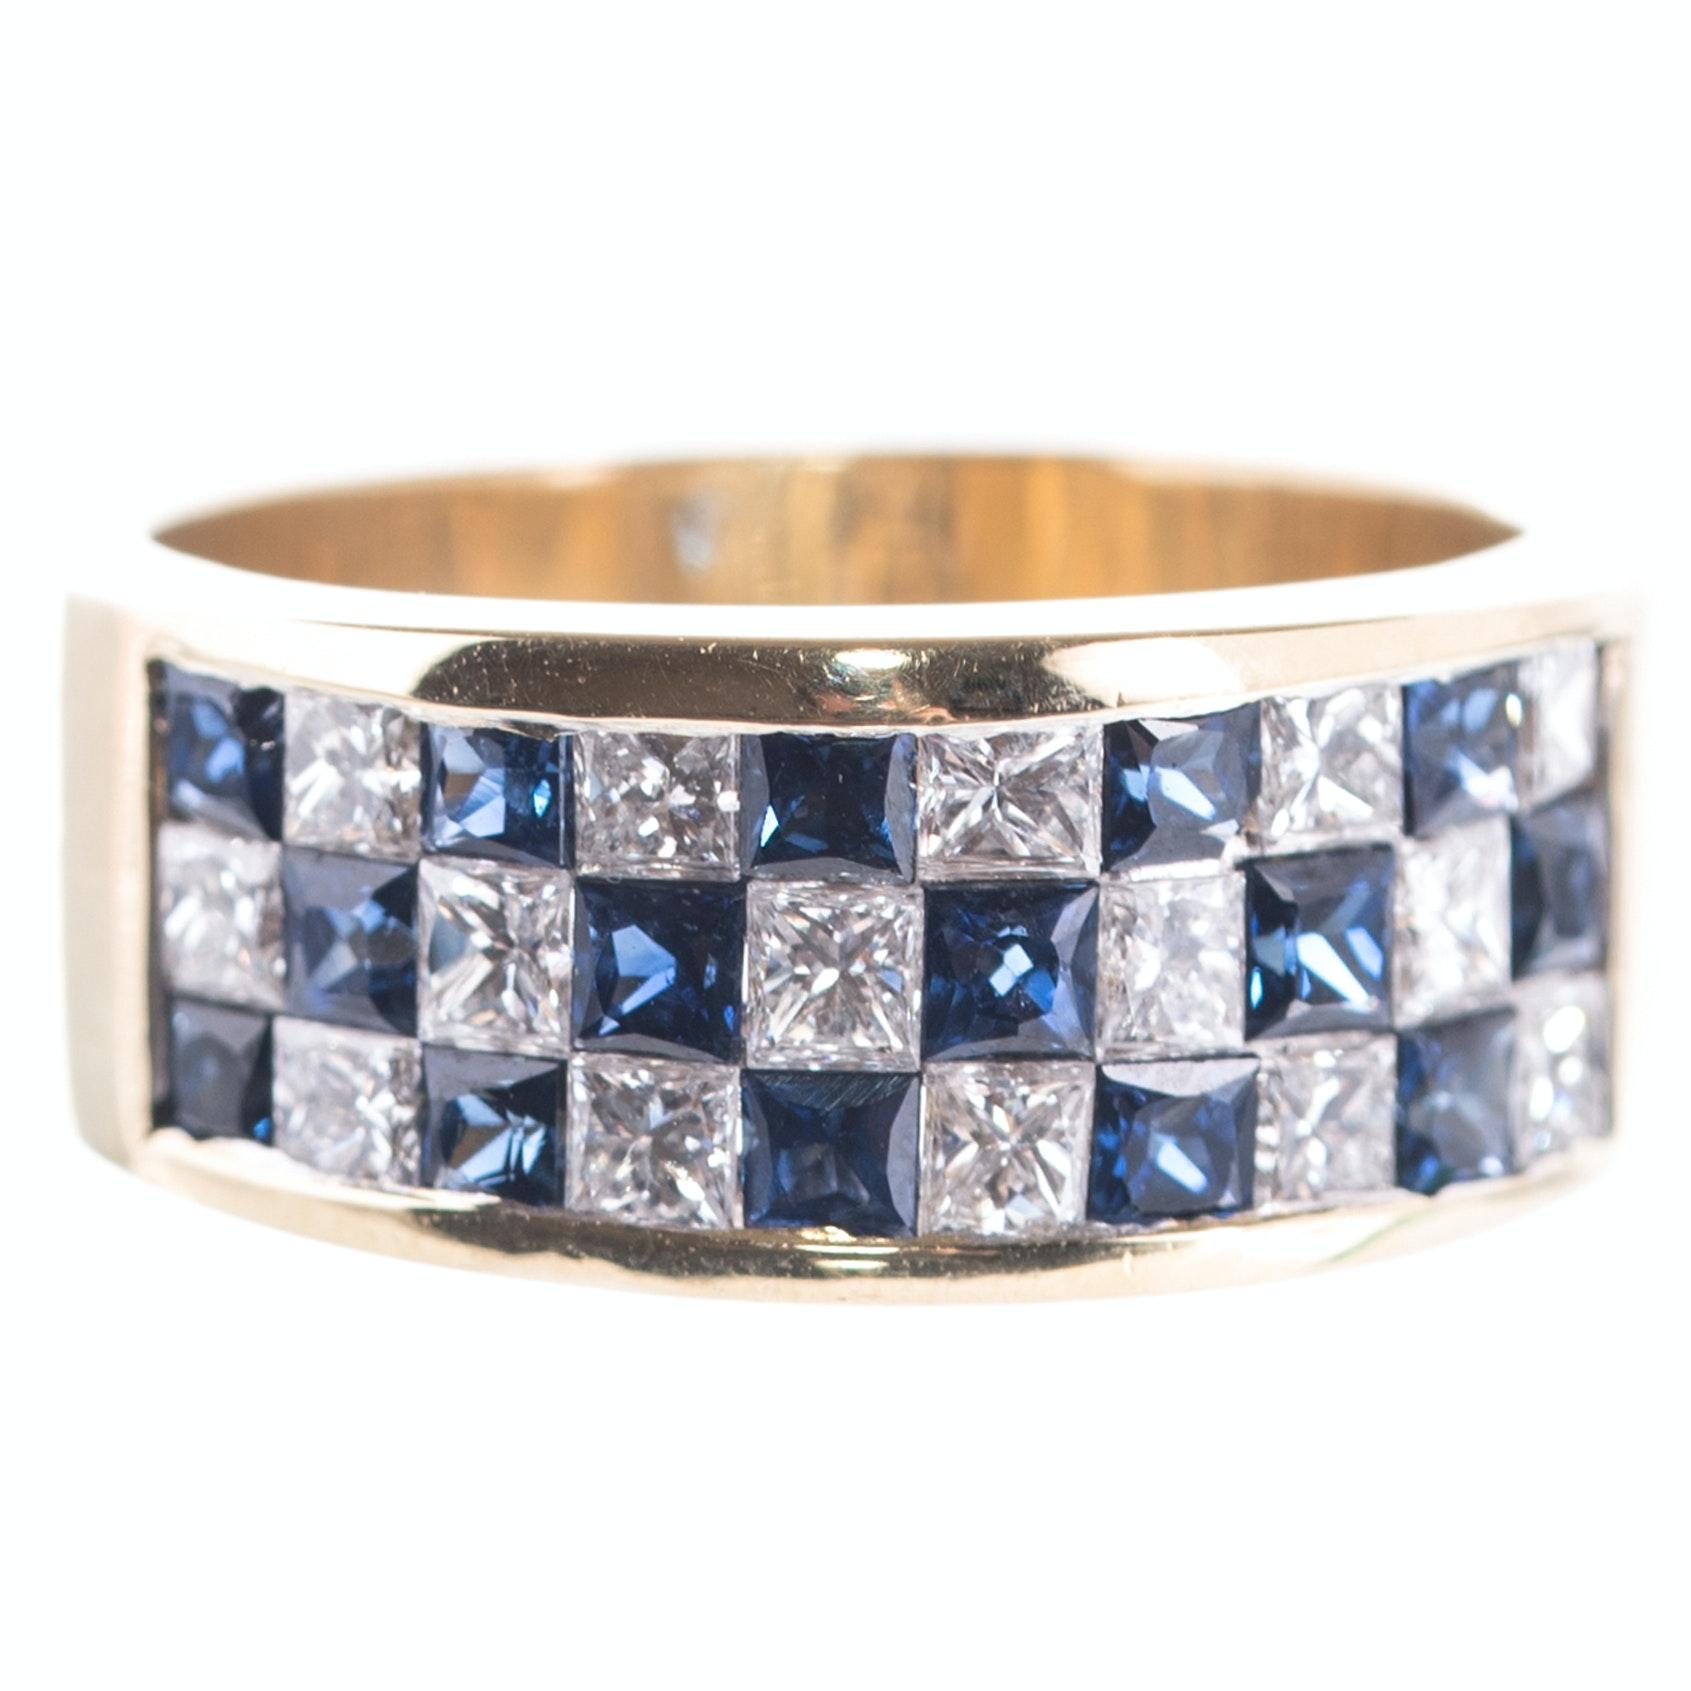 18K Yellow Gold, 1.05 CTW Diamond, and Sapphire Ring